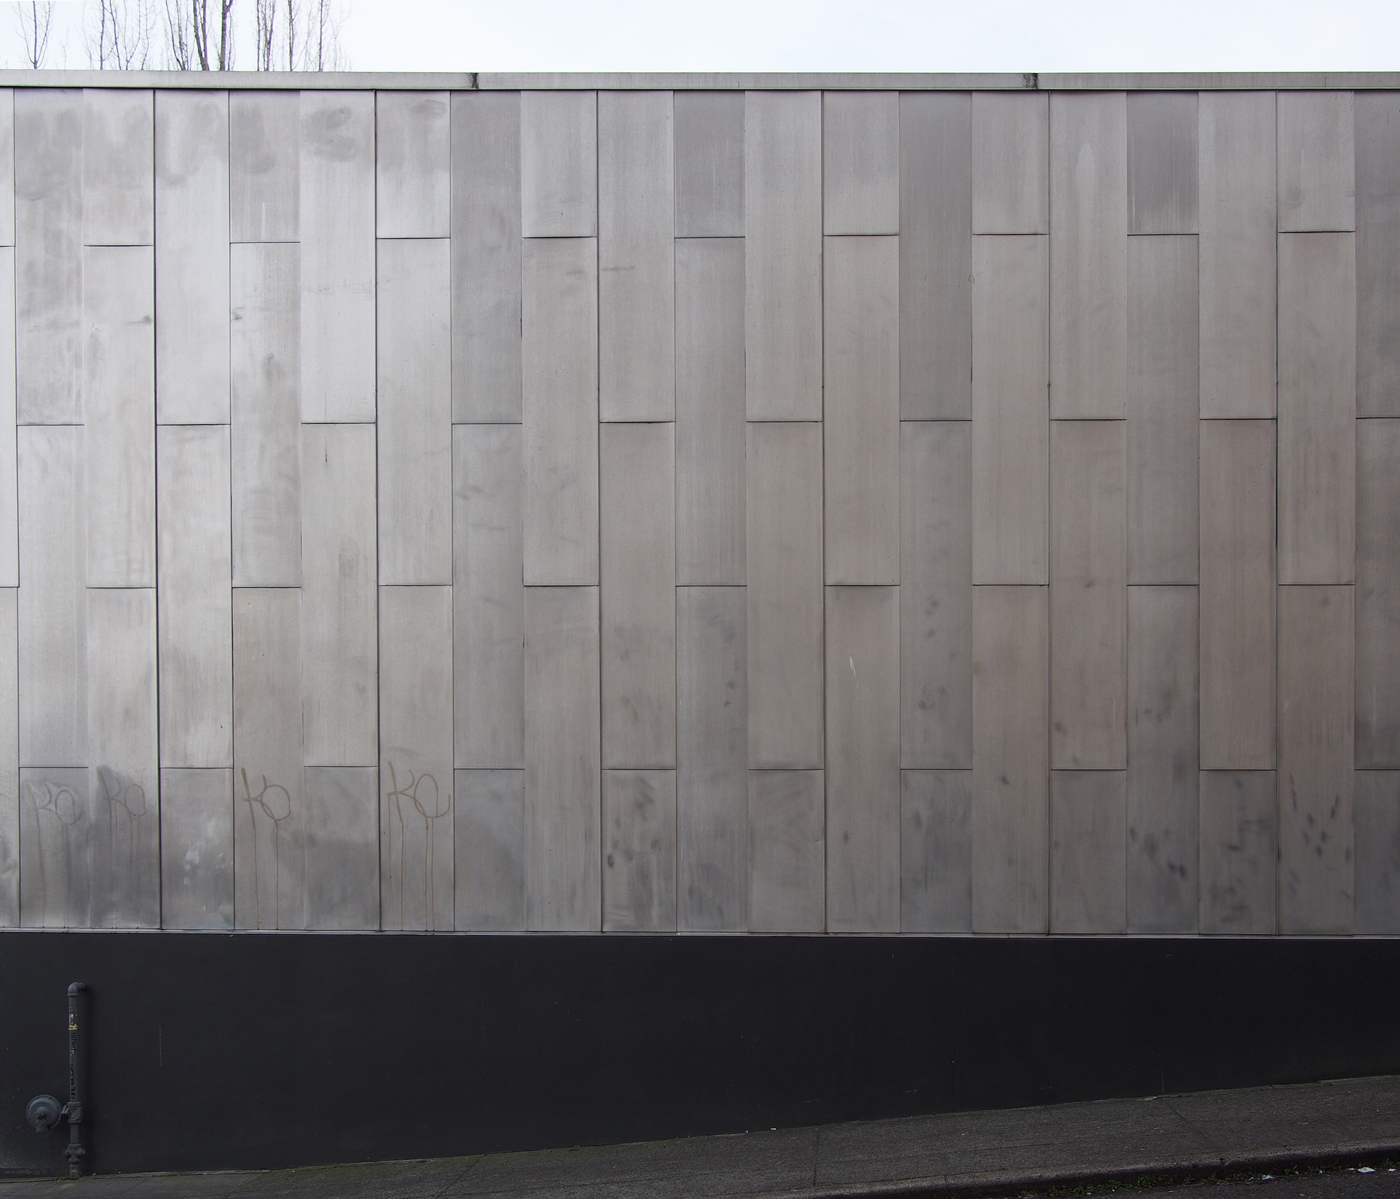 2014_0105 SS Wall small.jpg